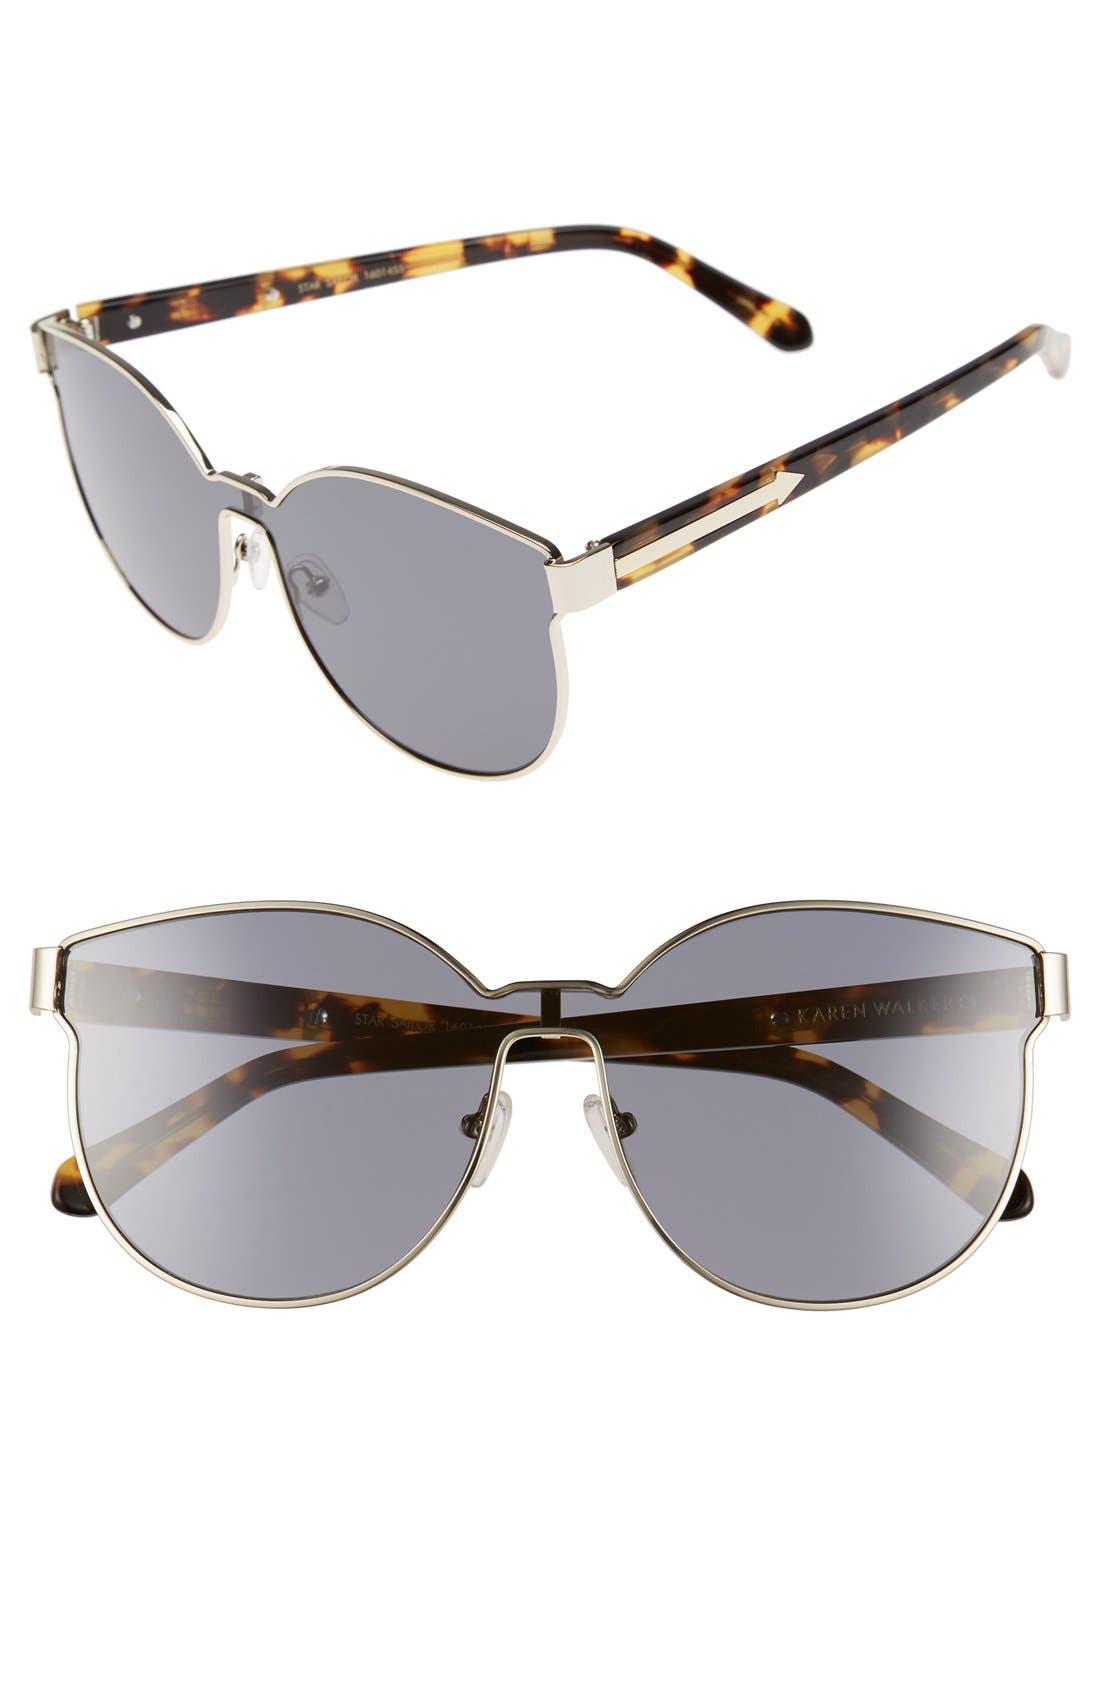 Karen Walker 'Star Sailor - Arrowed by Karen' 60mm Sunglasses